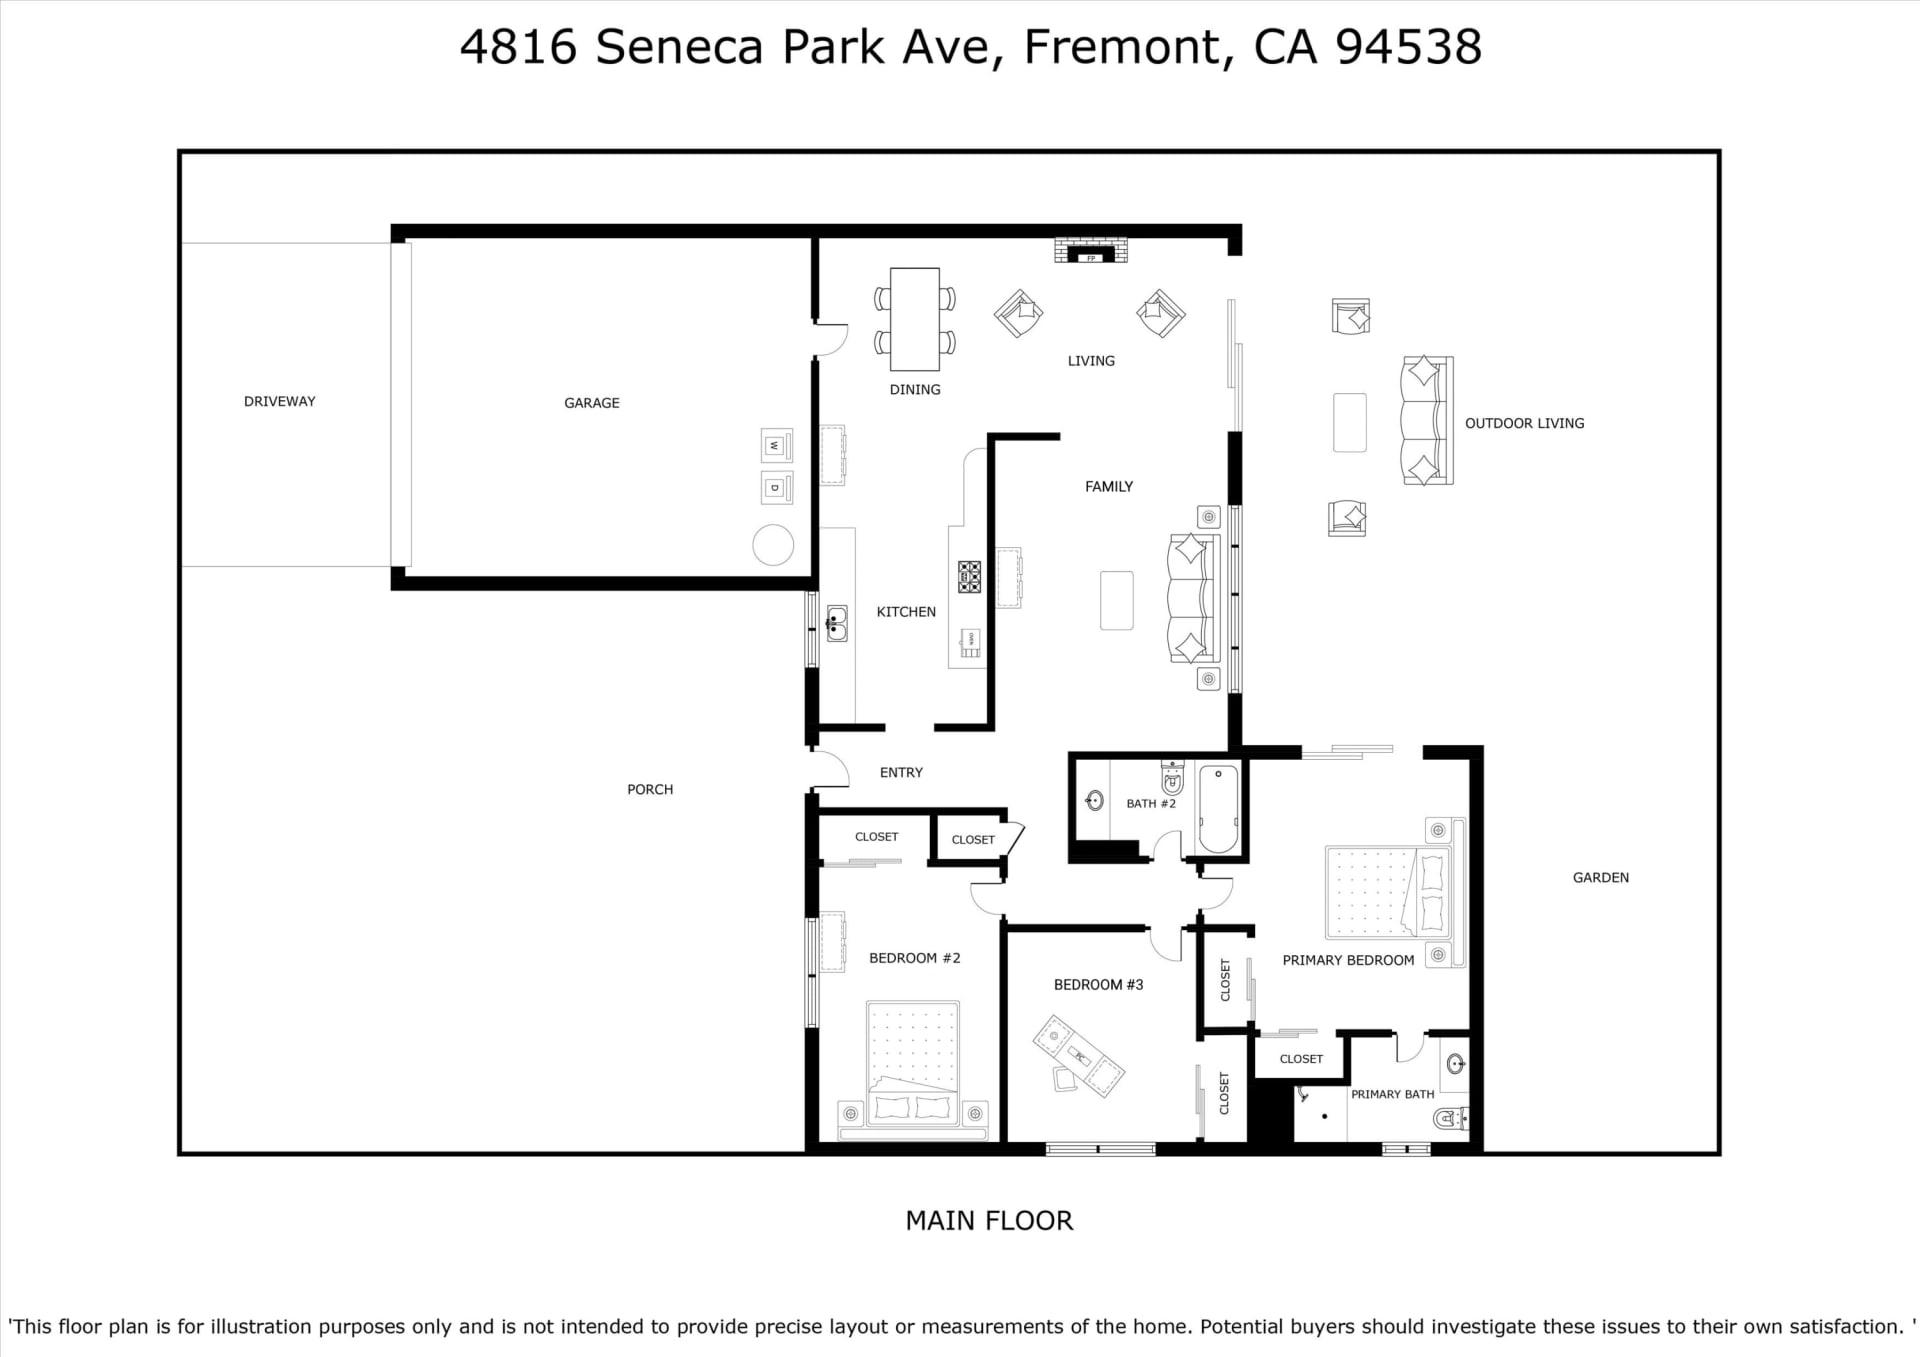 4816 Seneca Park Ave photo